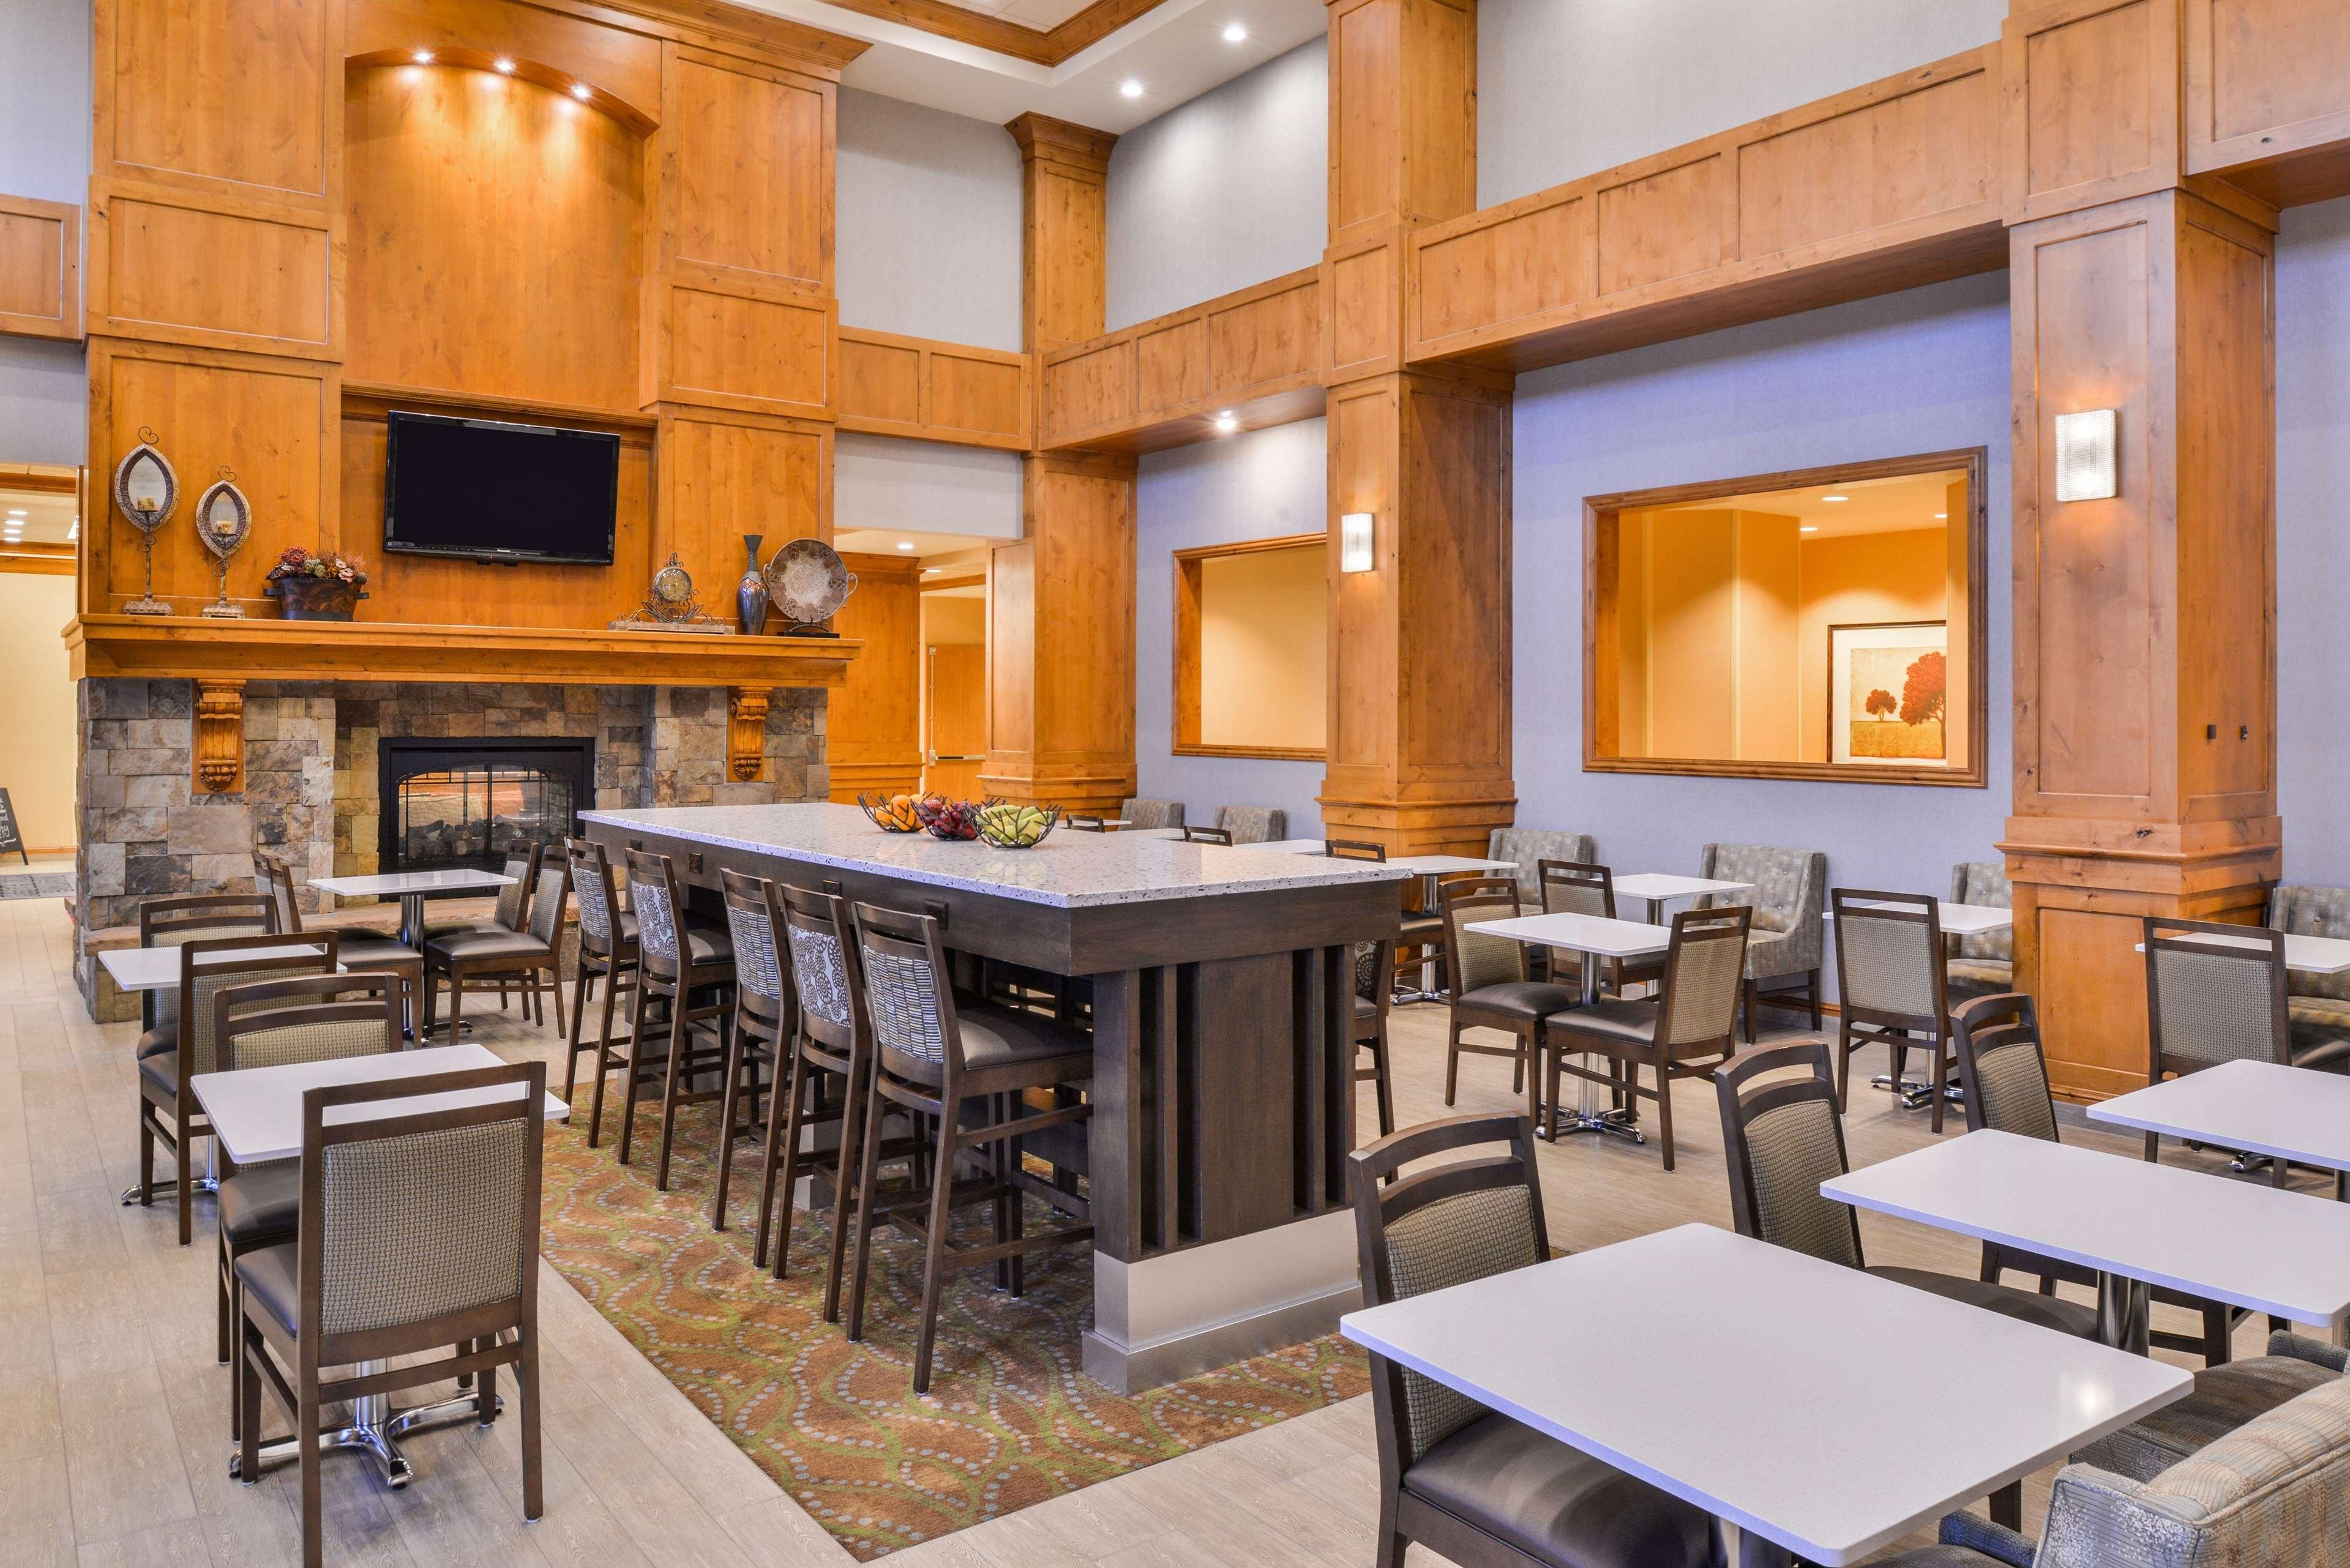 Hampton Inn & Suites Coeur d' Alene image 9